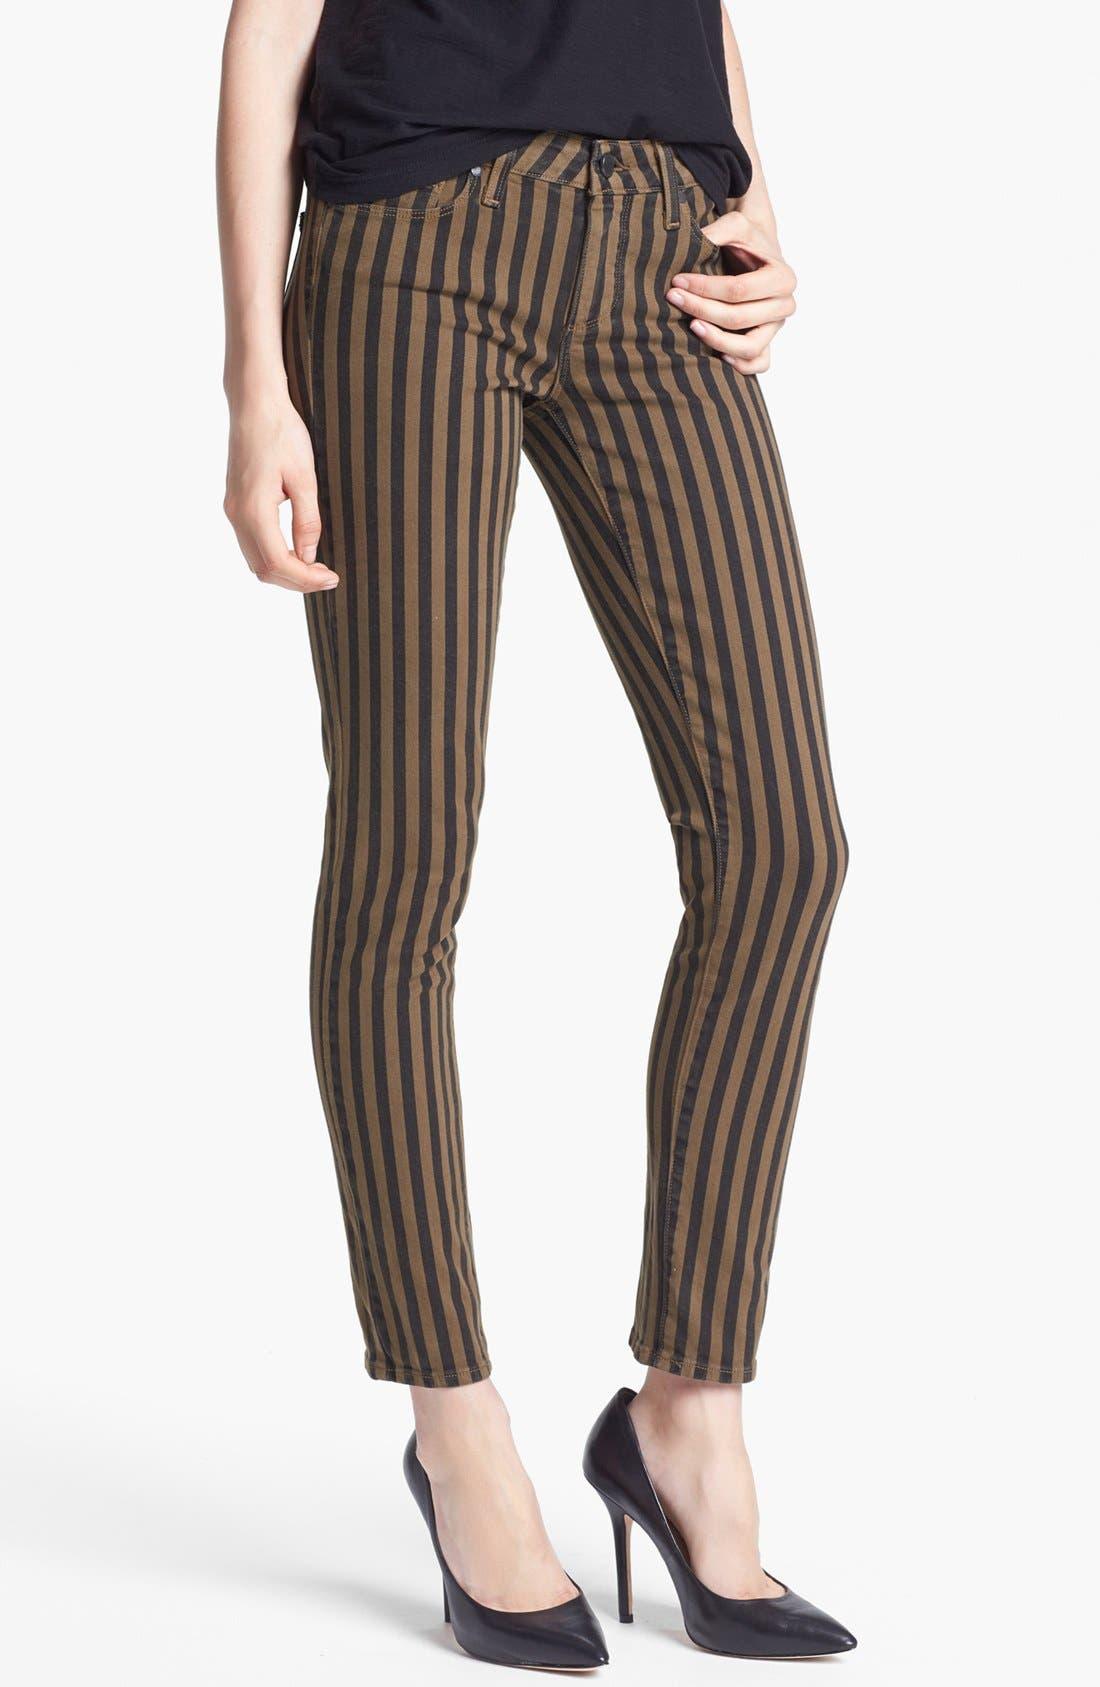 Alternate Image 1  - Paige Denim 'Skyline' Ankle Jeans (Olive Branch London Stripe)